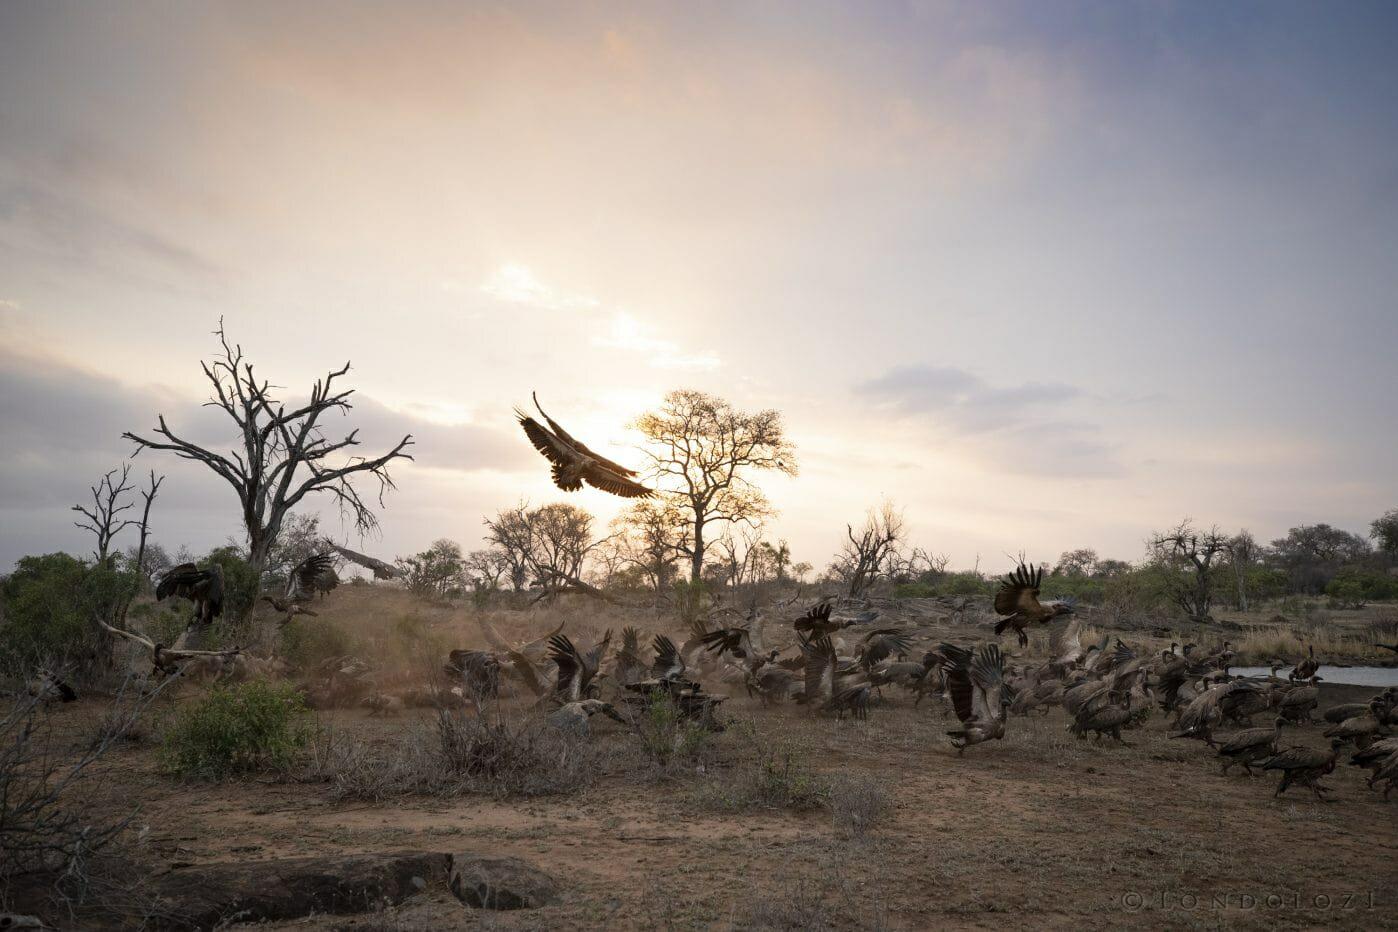 Hyena Vulture Bird 2